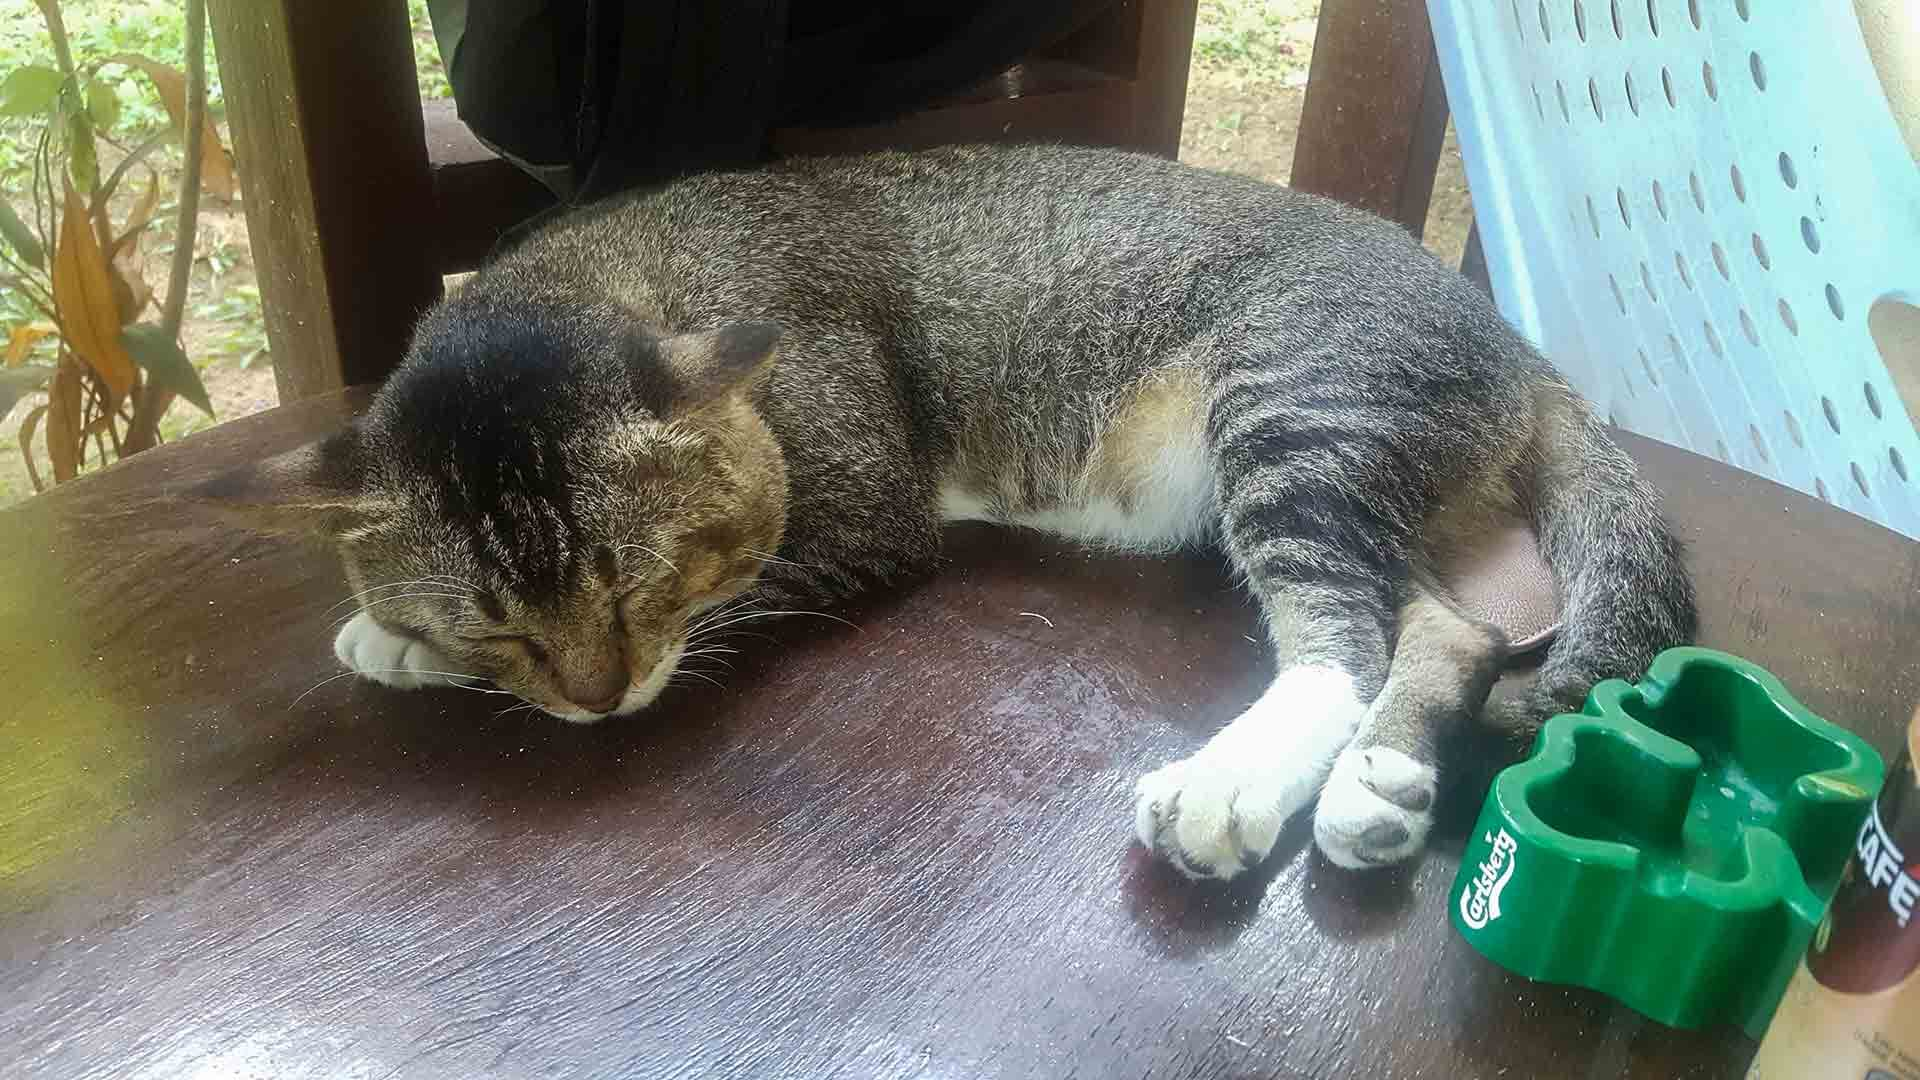 Cat sleeping on table in Tioman Island